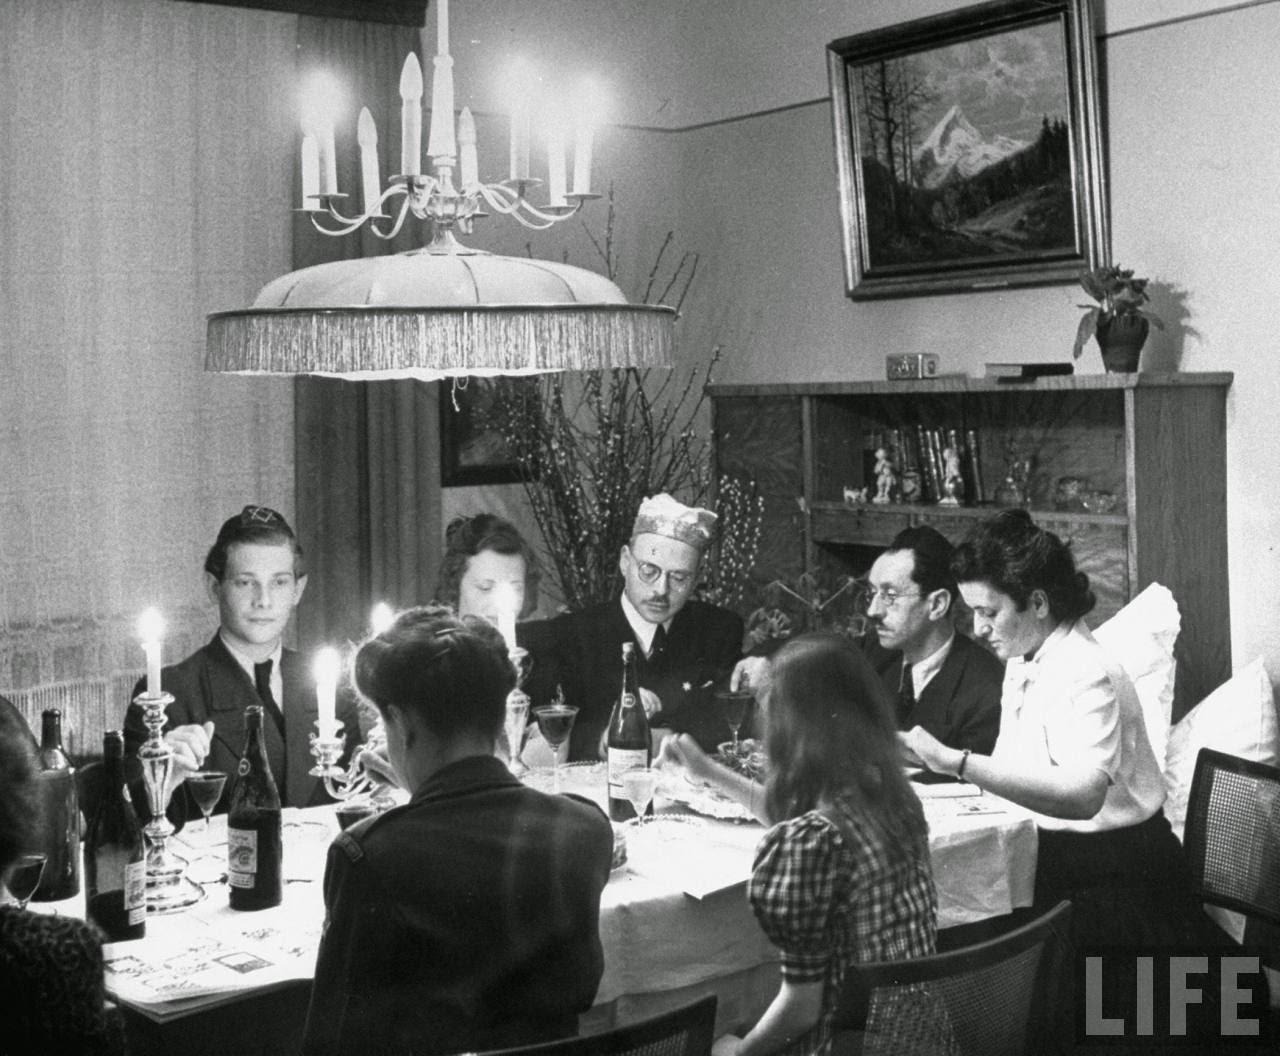 Passover in Berlin, 1945 (4)